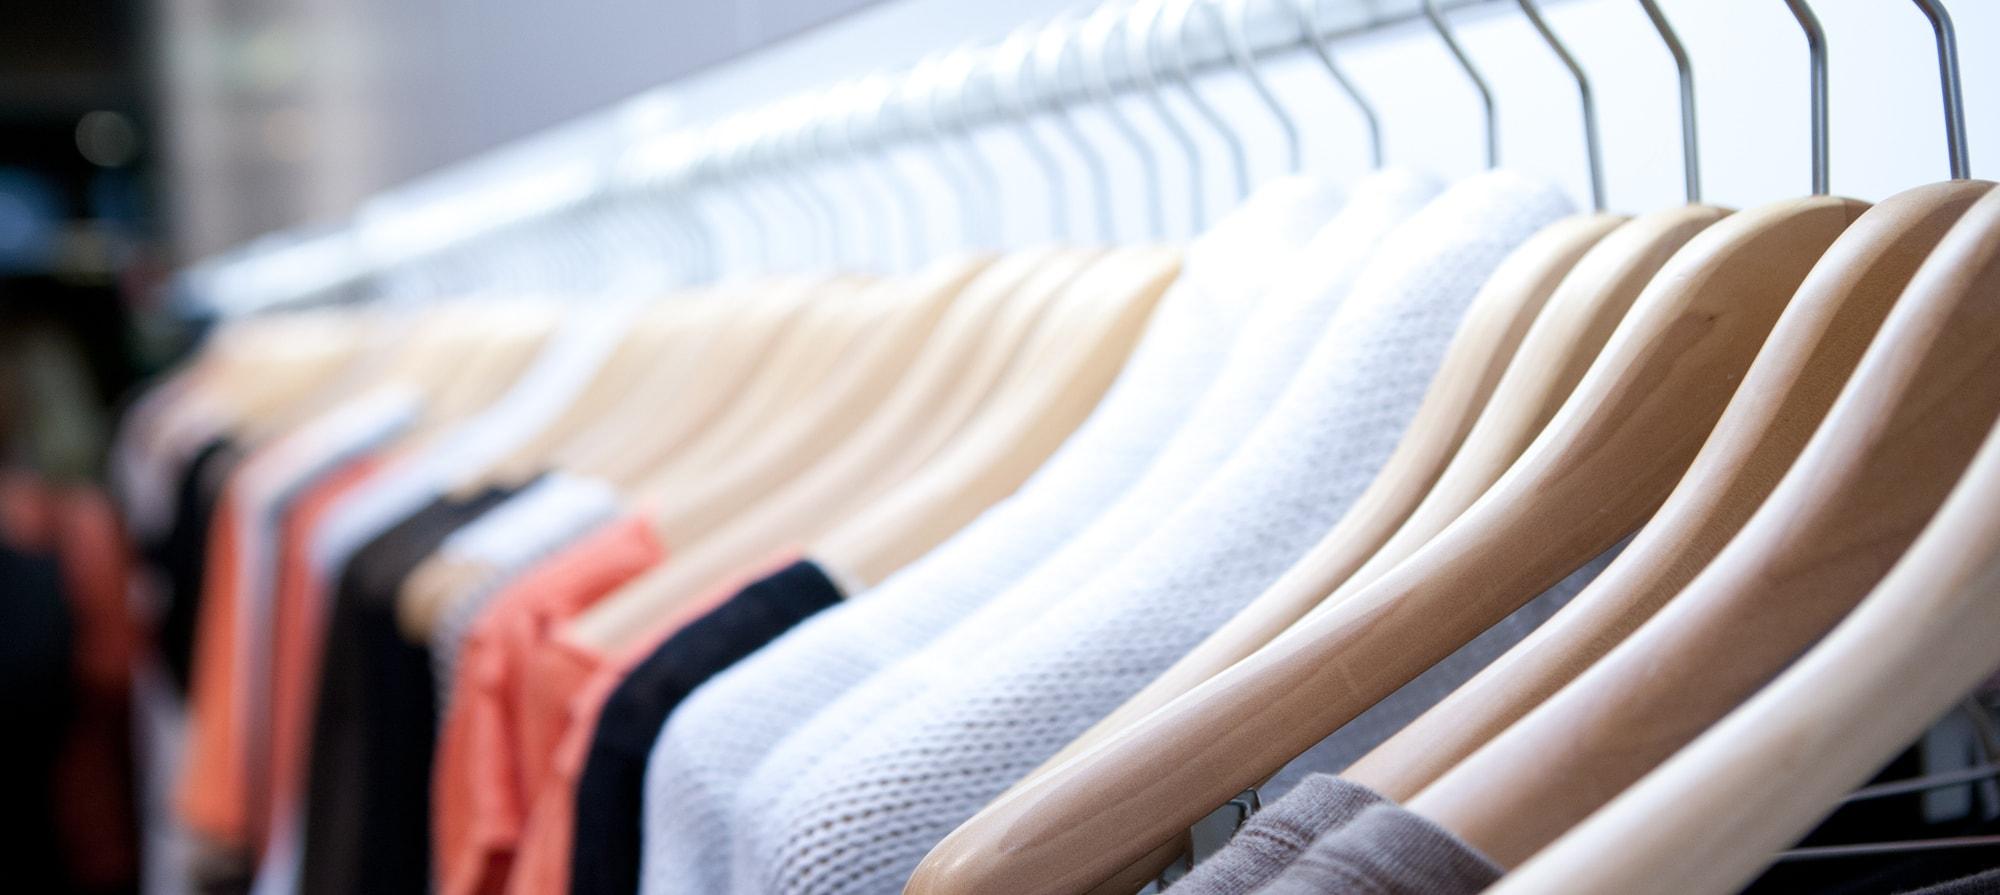 retail hangers amp retail suit hangers